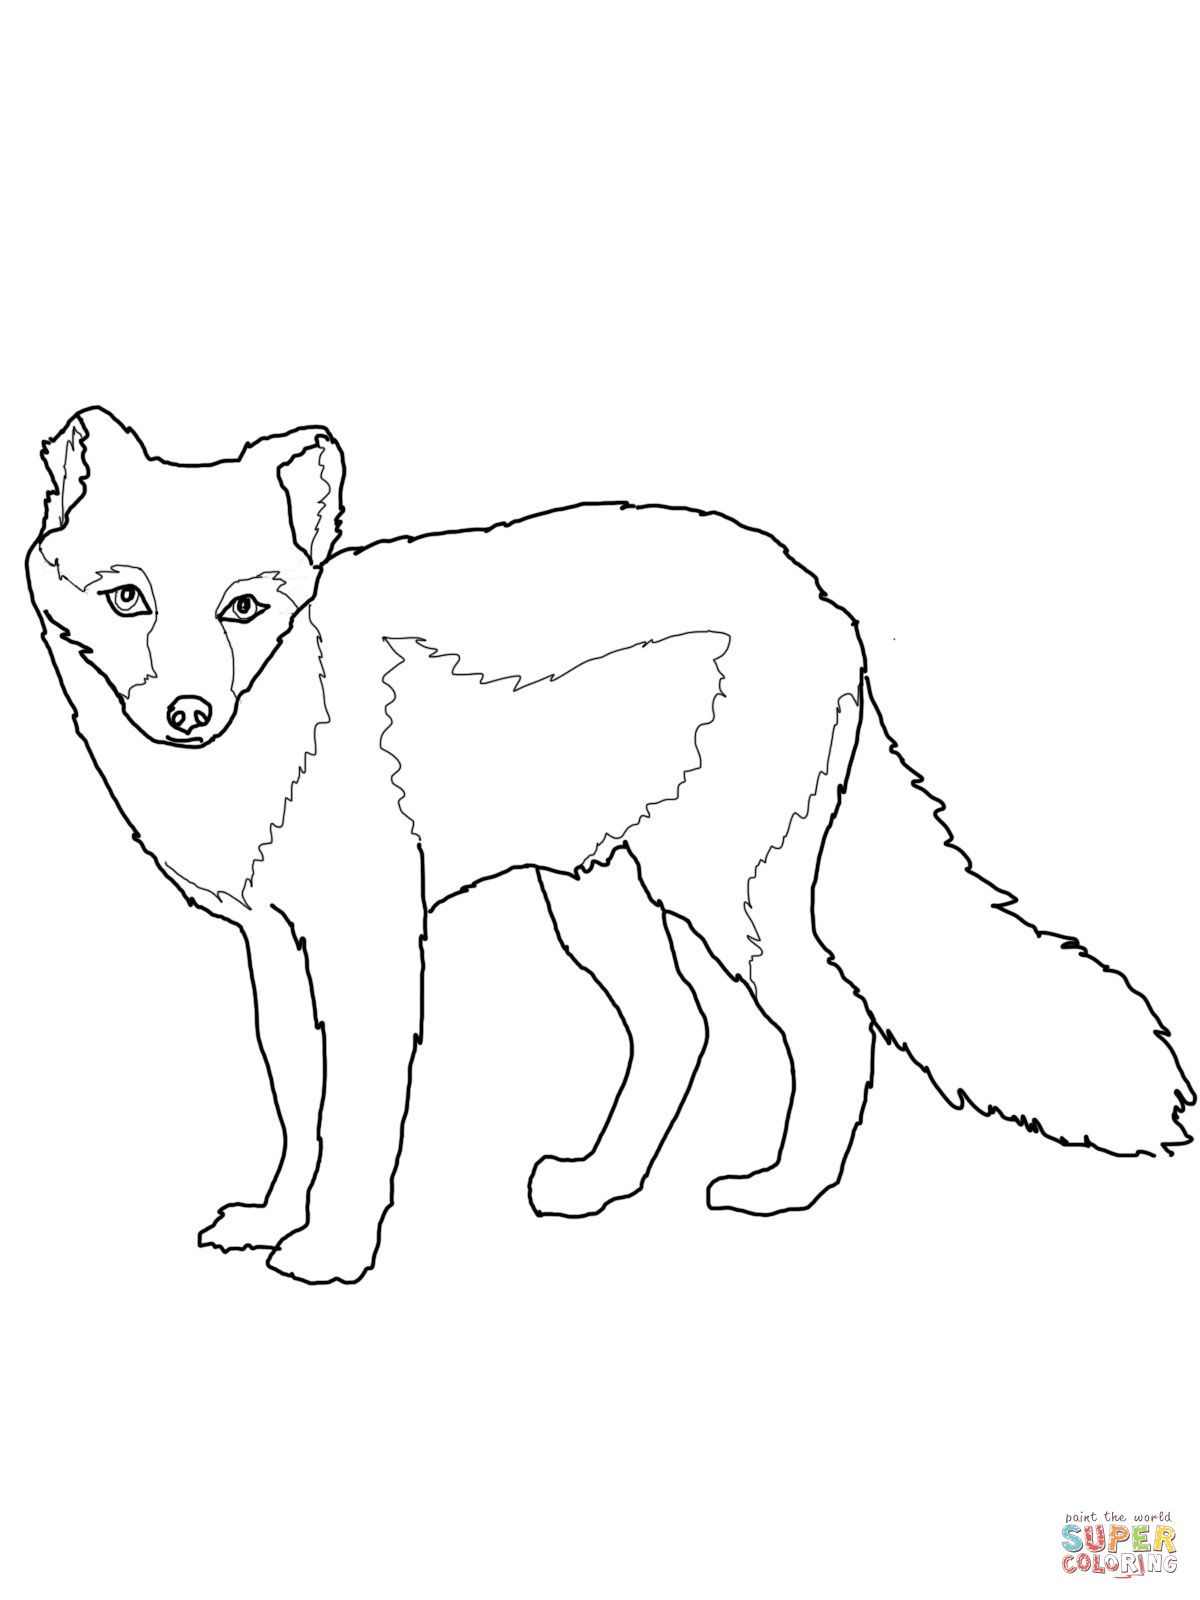 arcticfoxsummercoatcoloringpage (10×10)  fox